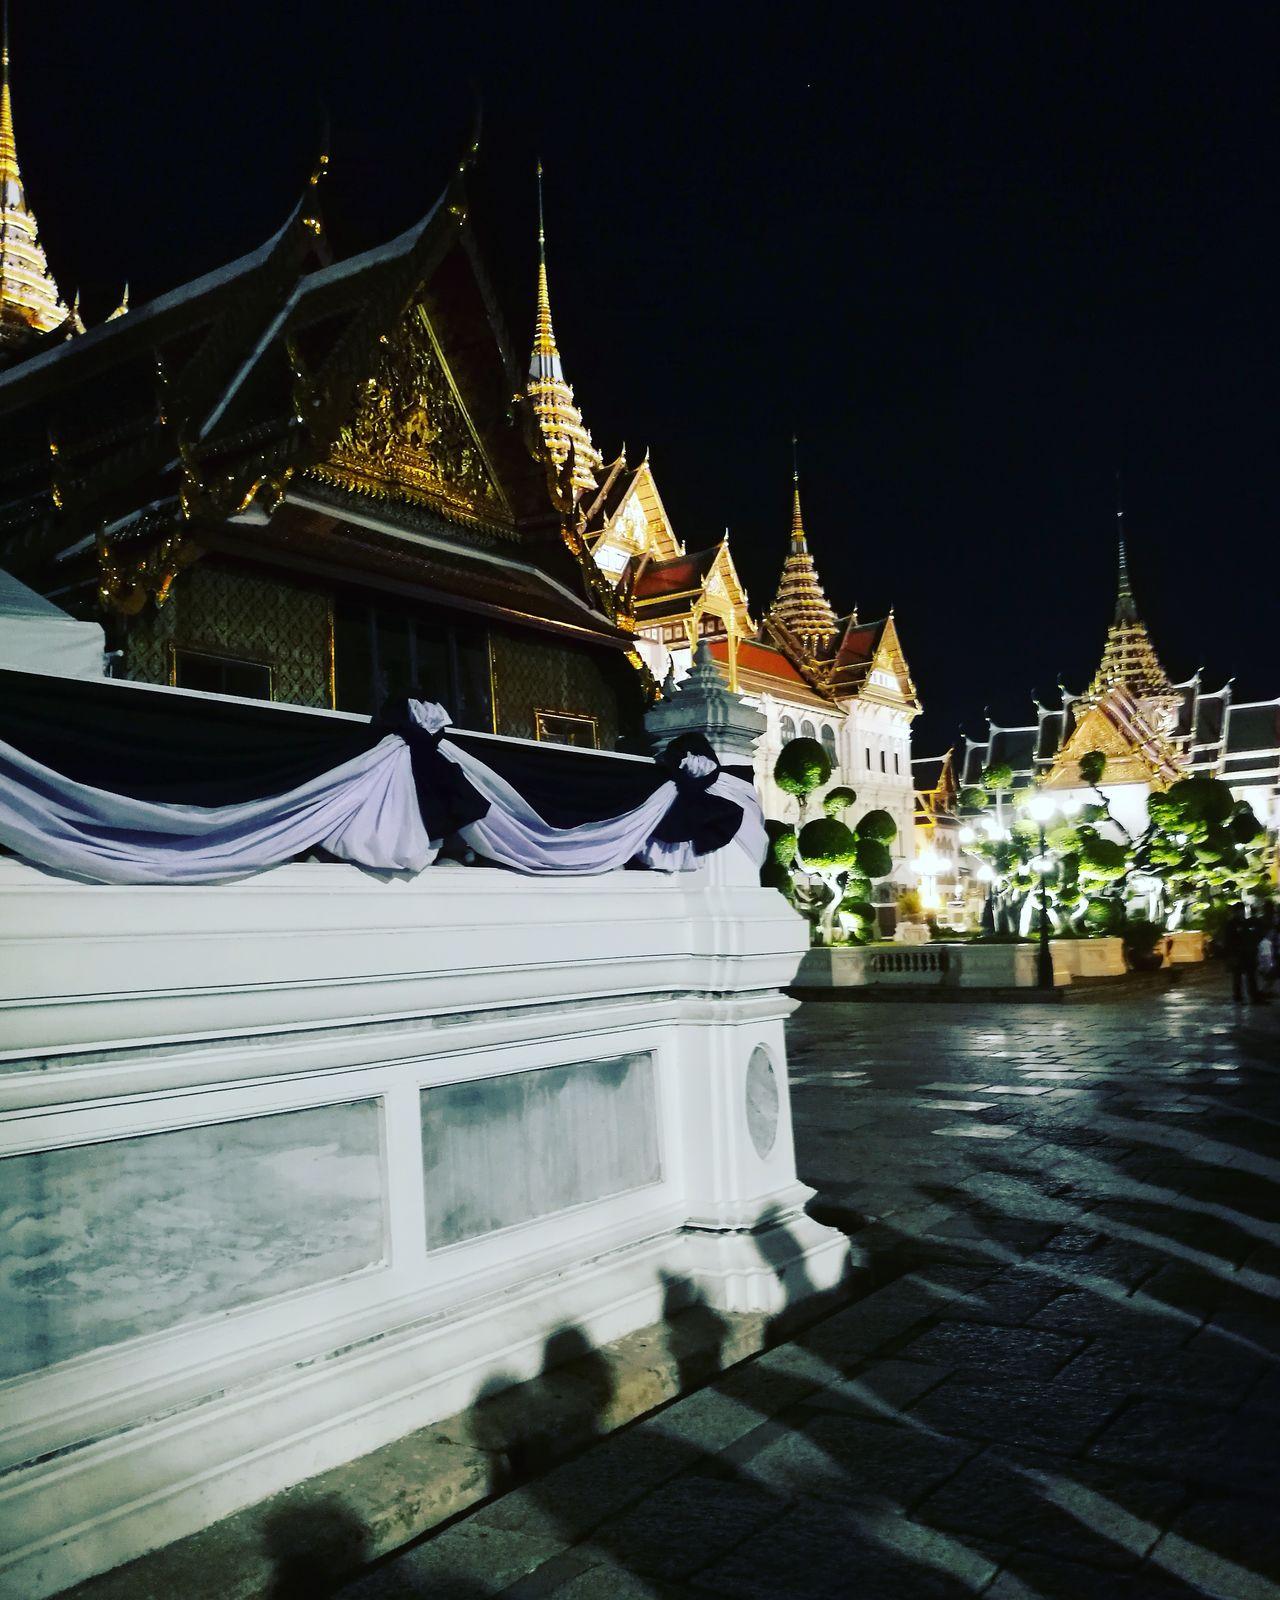 Architecture Night Shadow Illuminated Palace Grand Palace Bangkok Thailand Thai Architecture Bangkok Thailand Travel Destinations Outdoors The Architect - 2017 EyeEm Awards